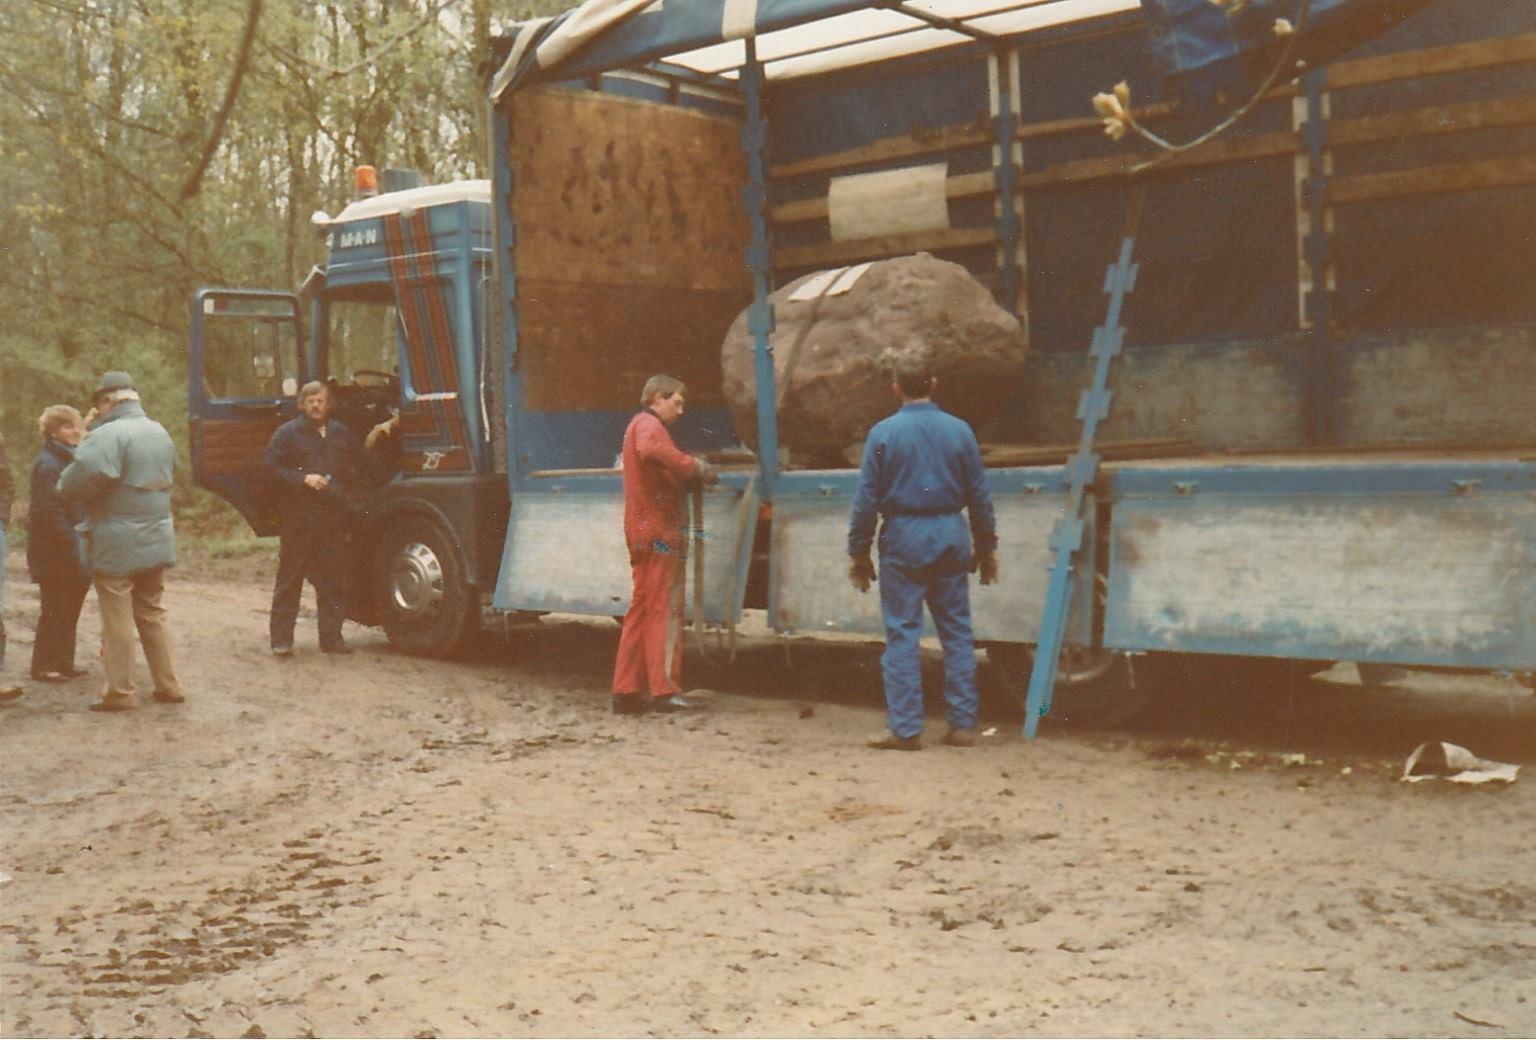 italiaanse-keien-voor-dierenpark-amersfoort-liggen-er-nog-steeds